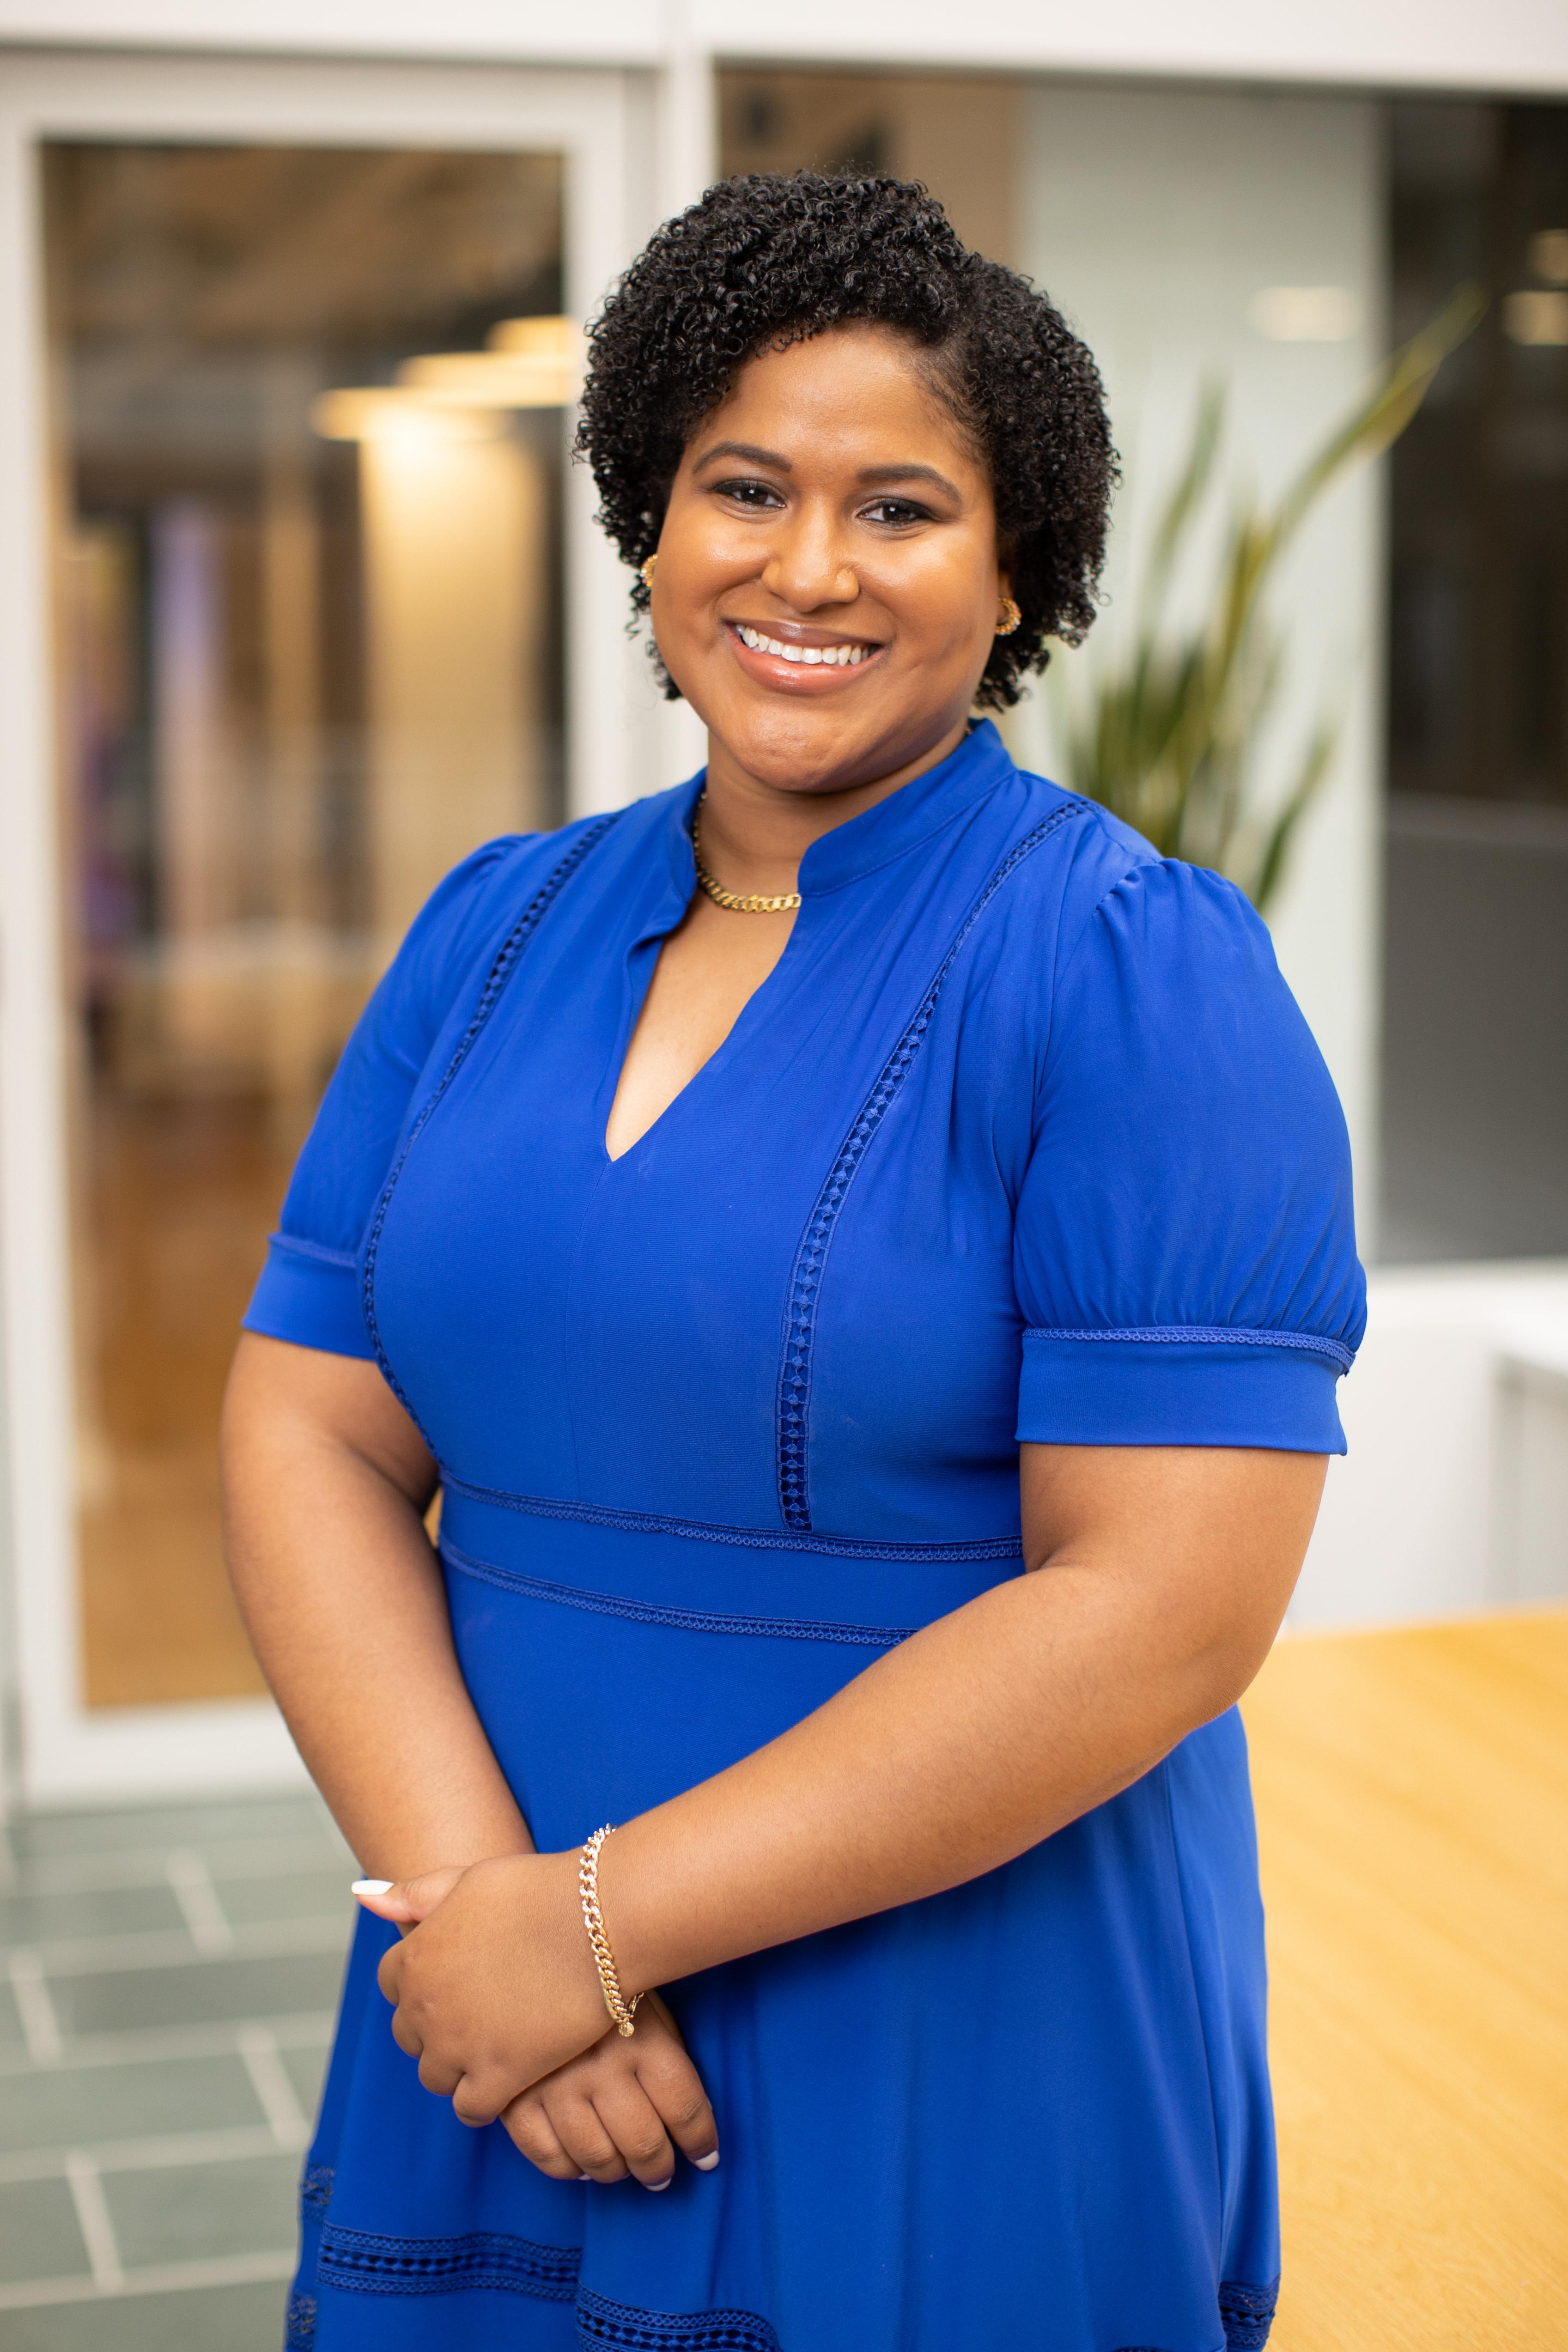 Stephanie Cummings